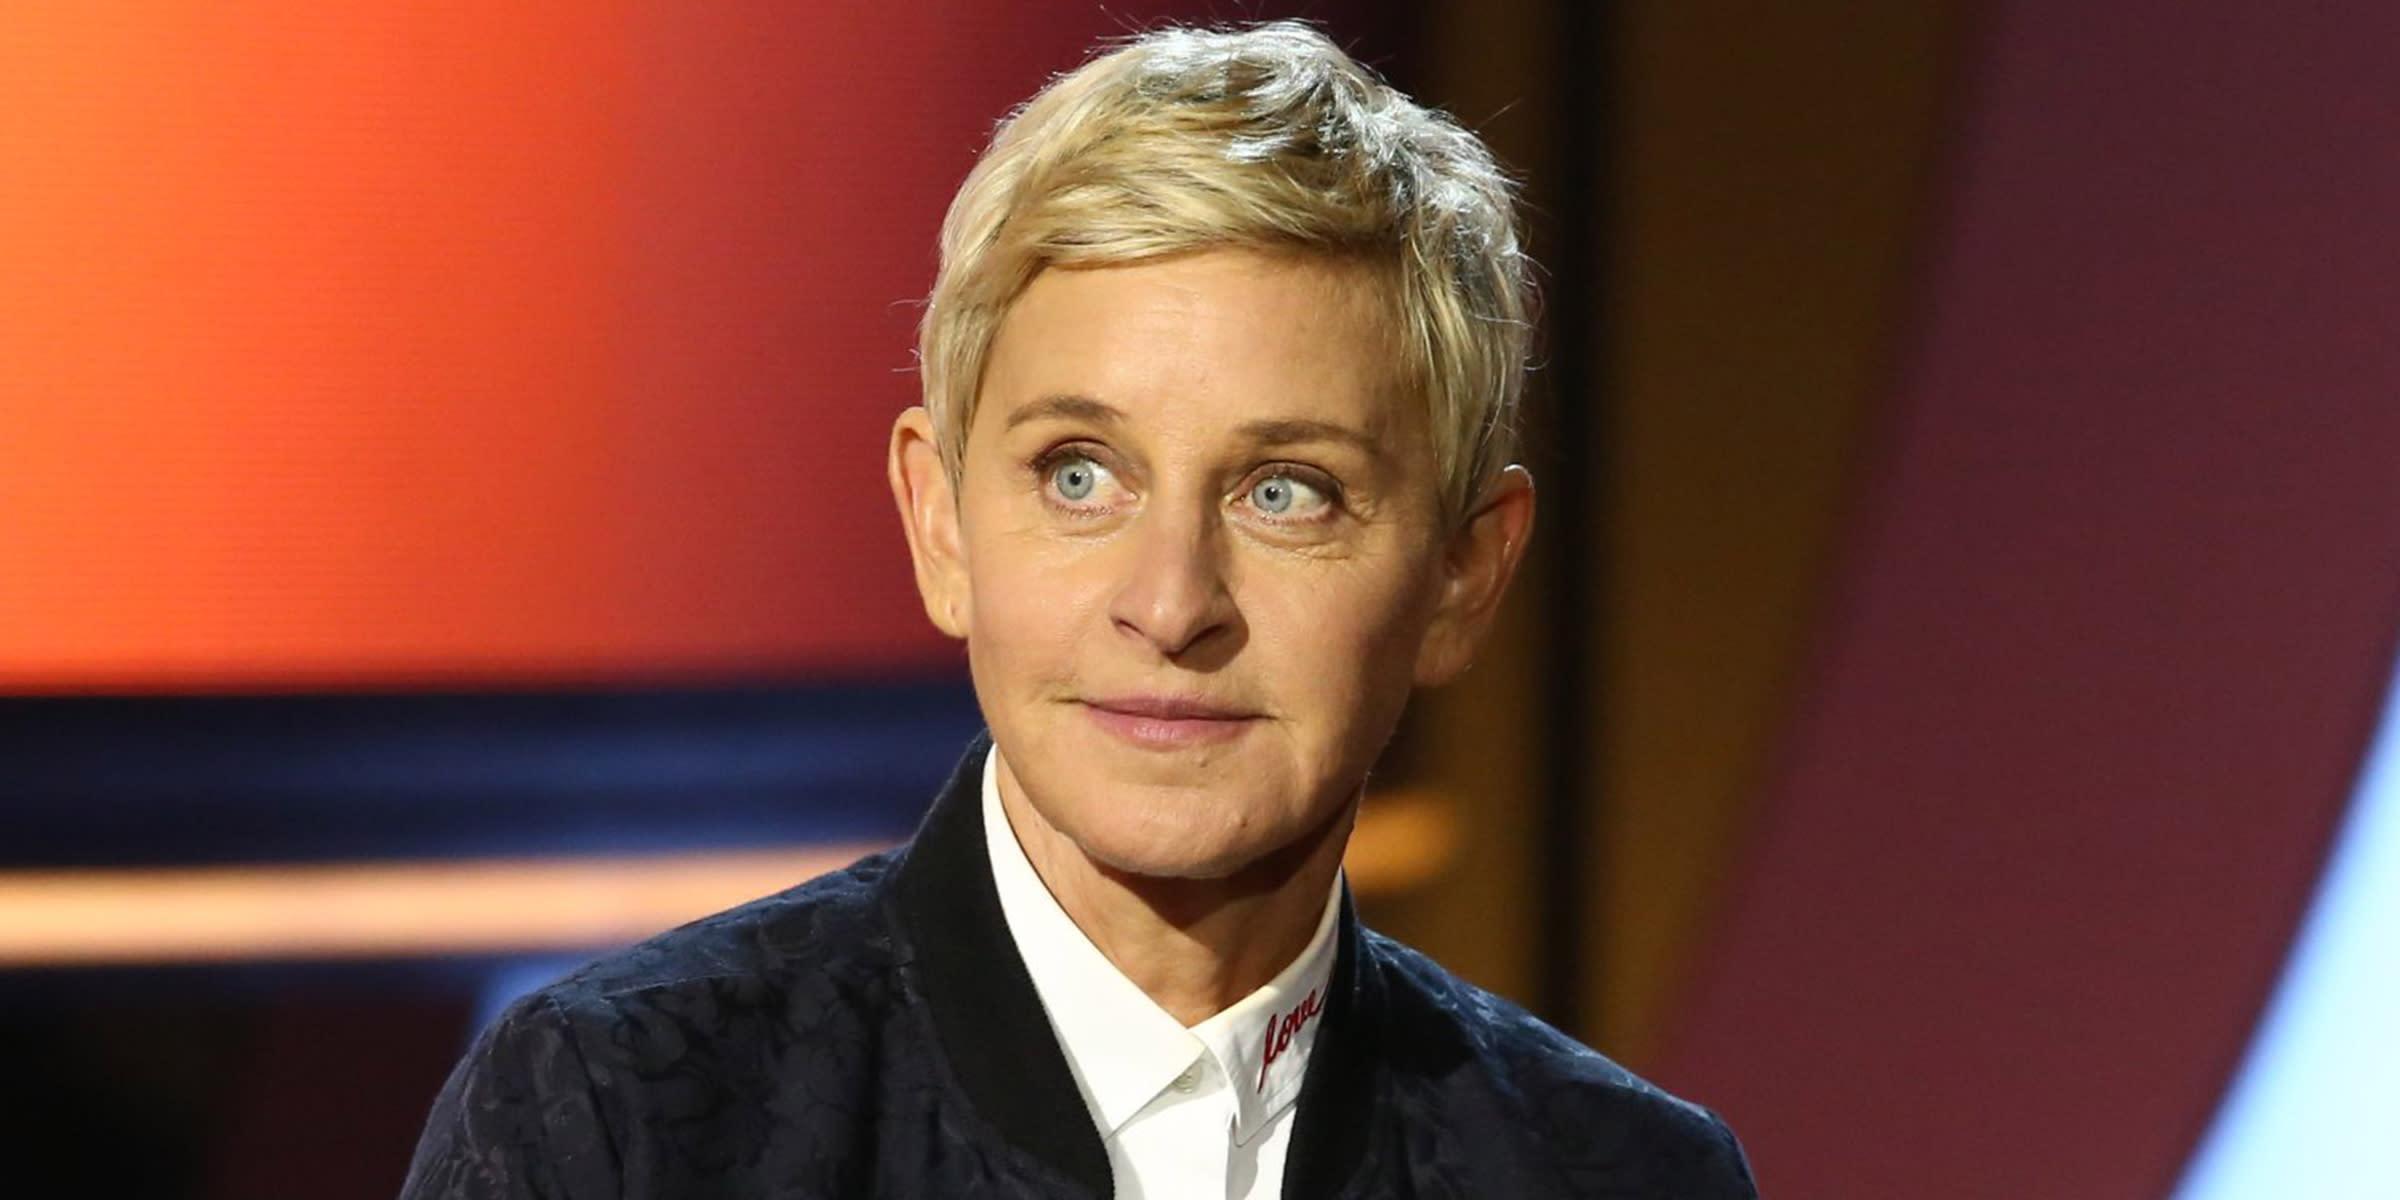 'Ellen DeGeneres Show' workplace under investigation by Warner Media